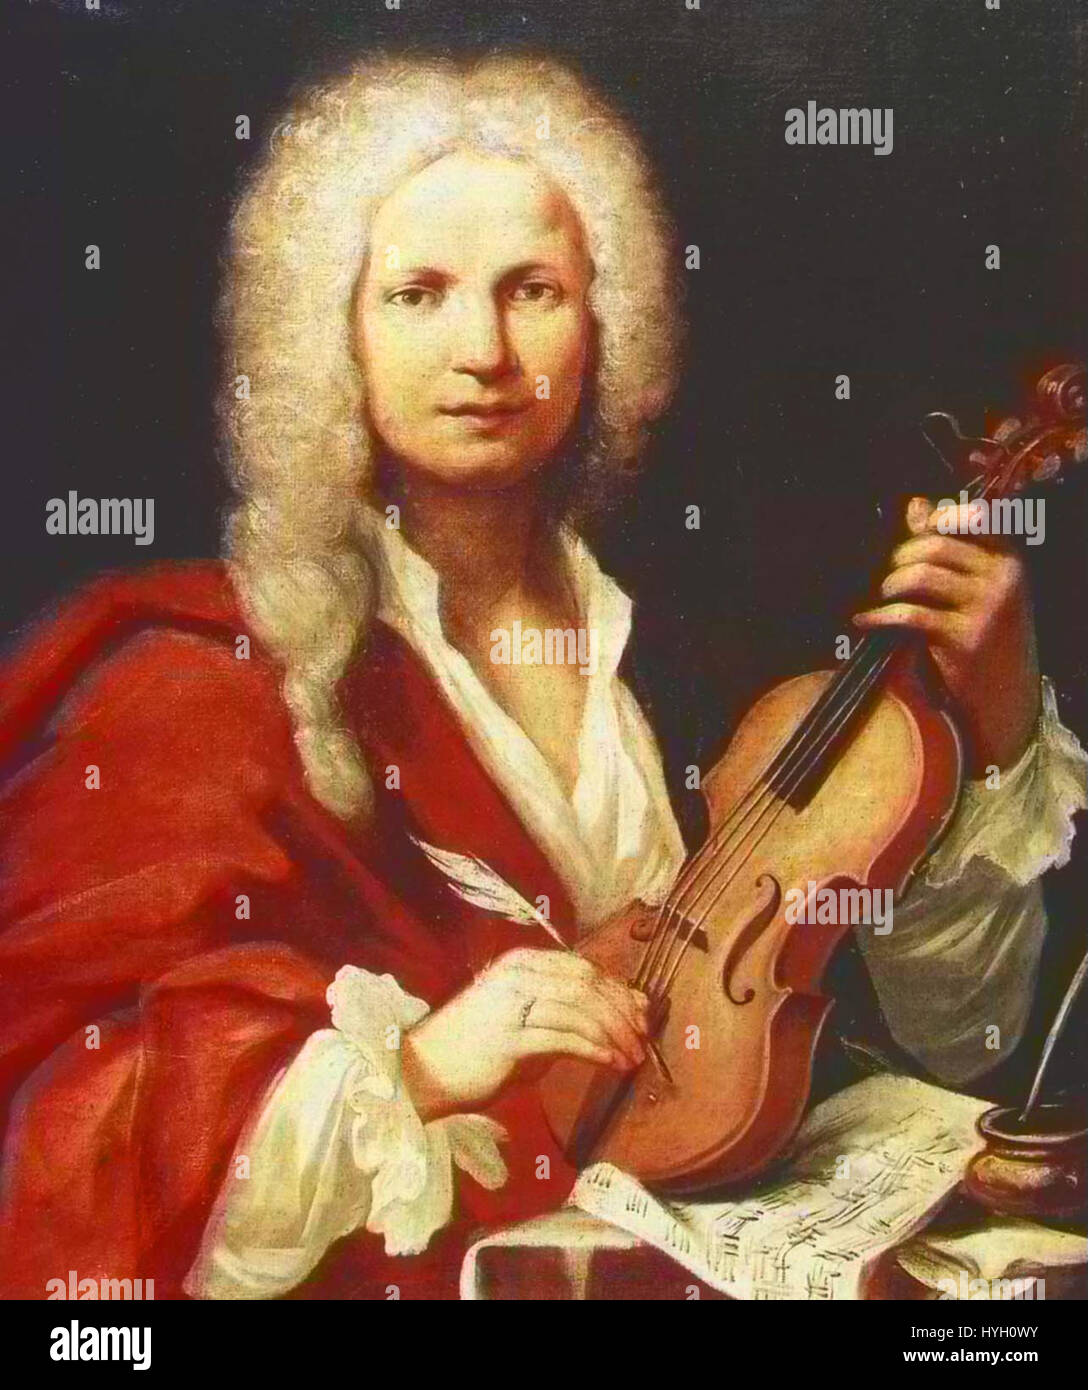 Vivaldi - Stock Image